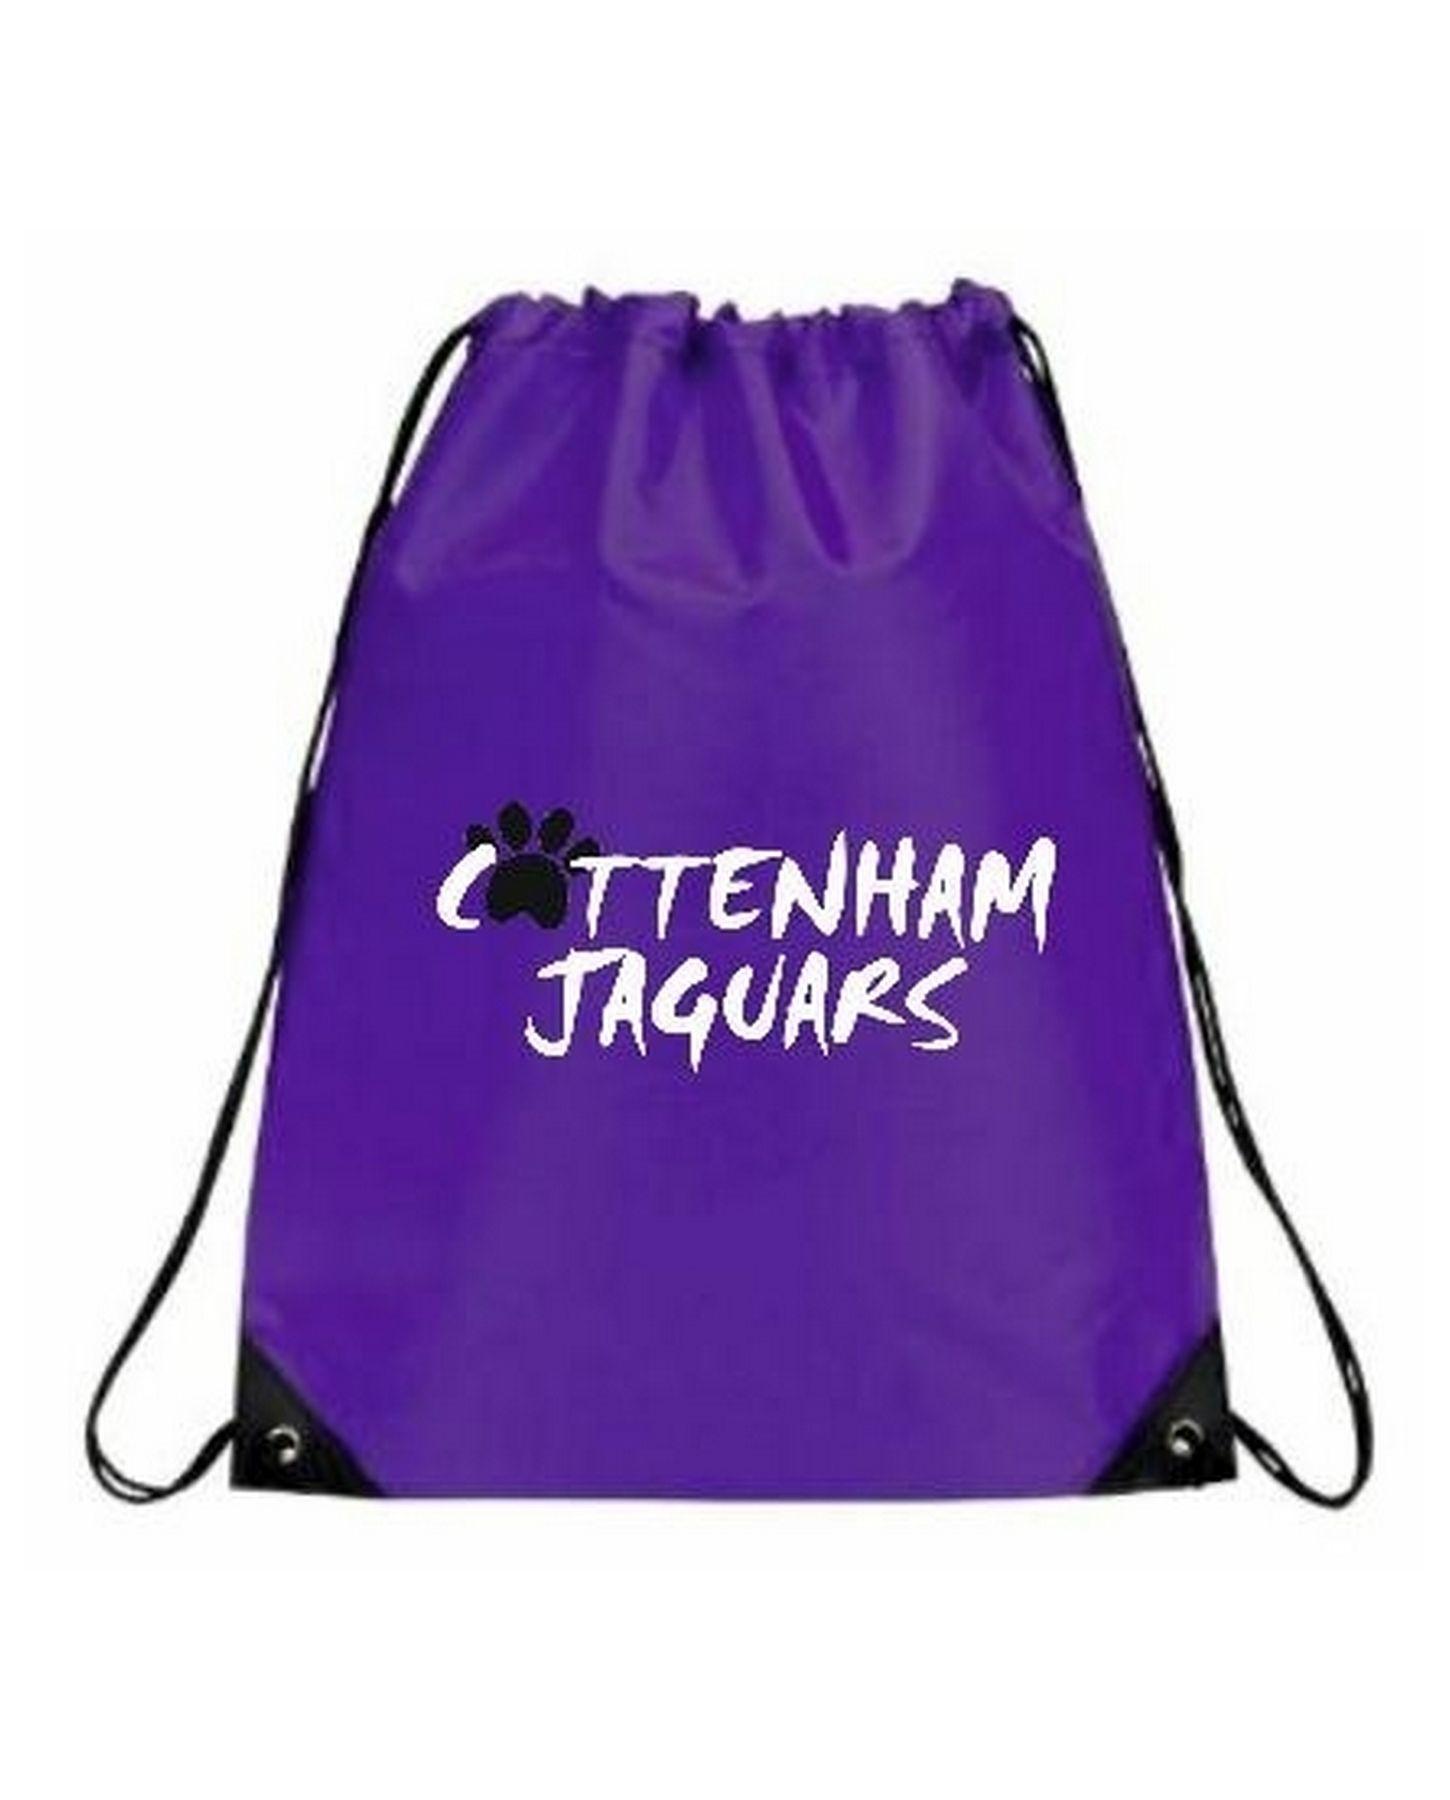 Cottenham Jaguars Netball Club – Drawstring Bag